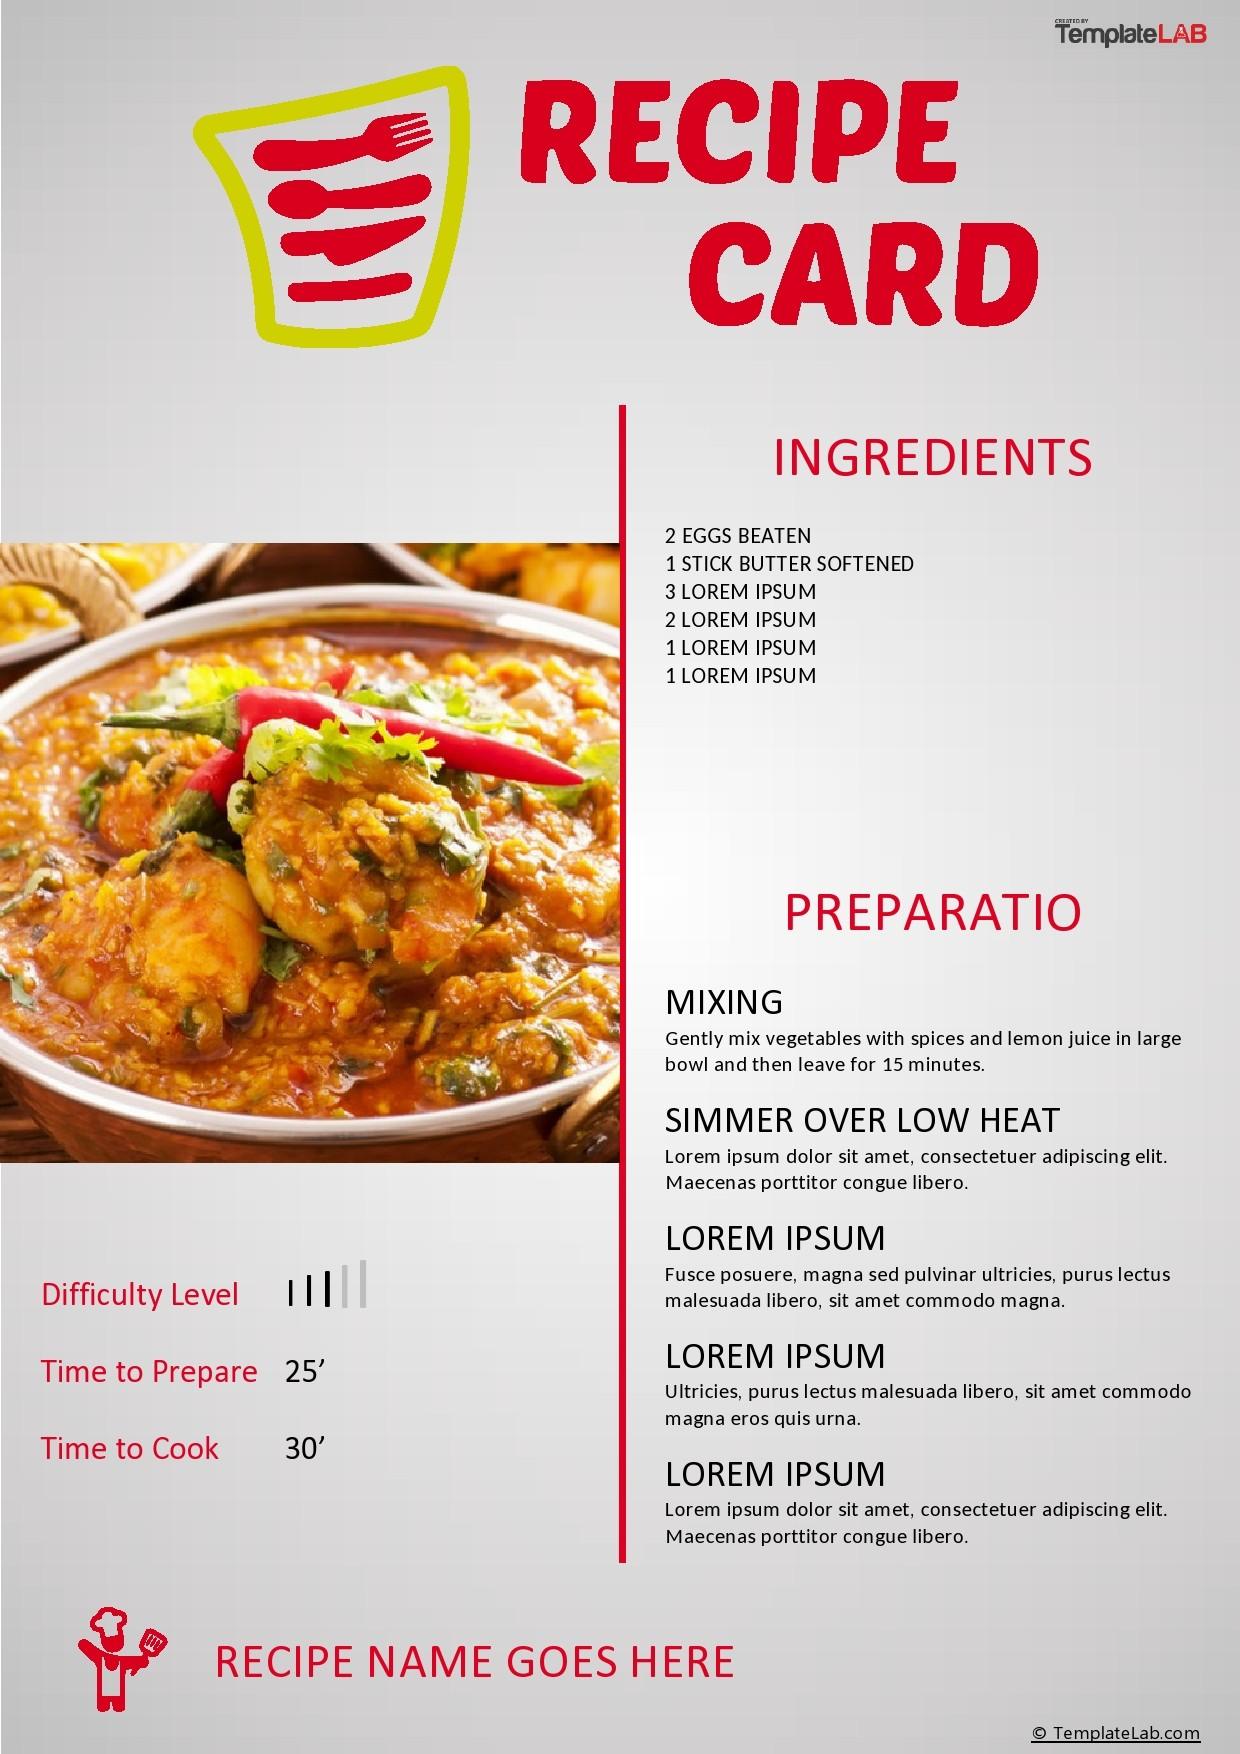 Free Recipe Card Template 03 - TemplateLab.com